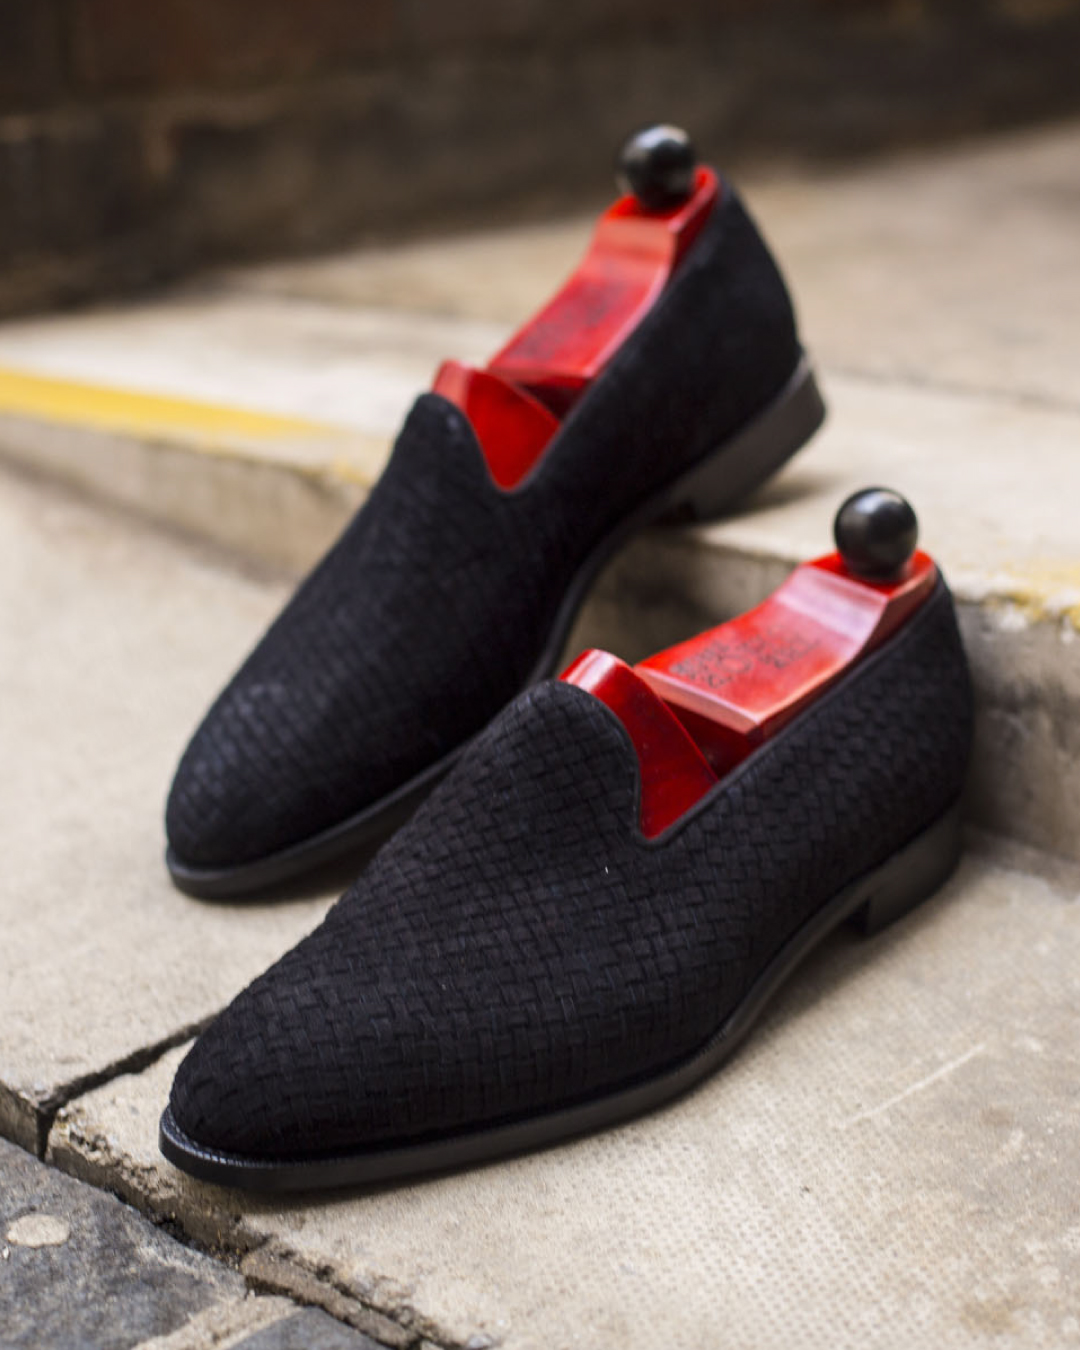 j-fitzpatrick-footwear-banner-loafer-instagram-3-2019.jpg